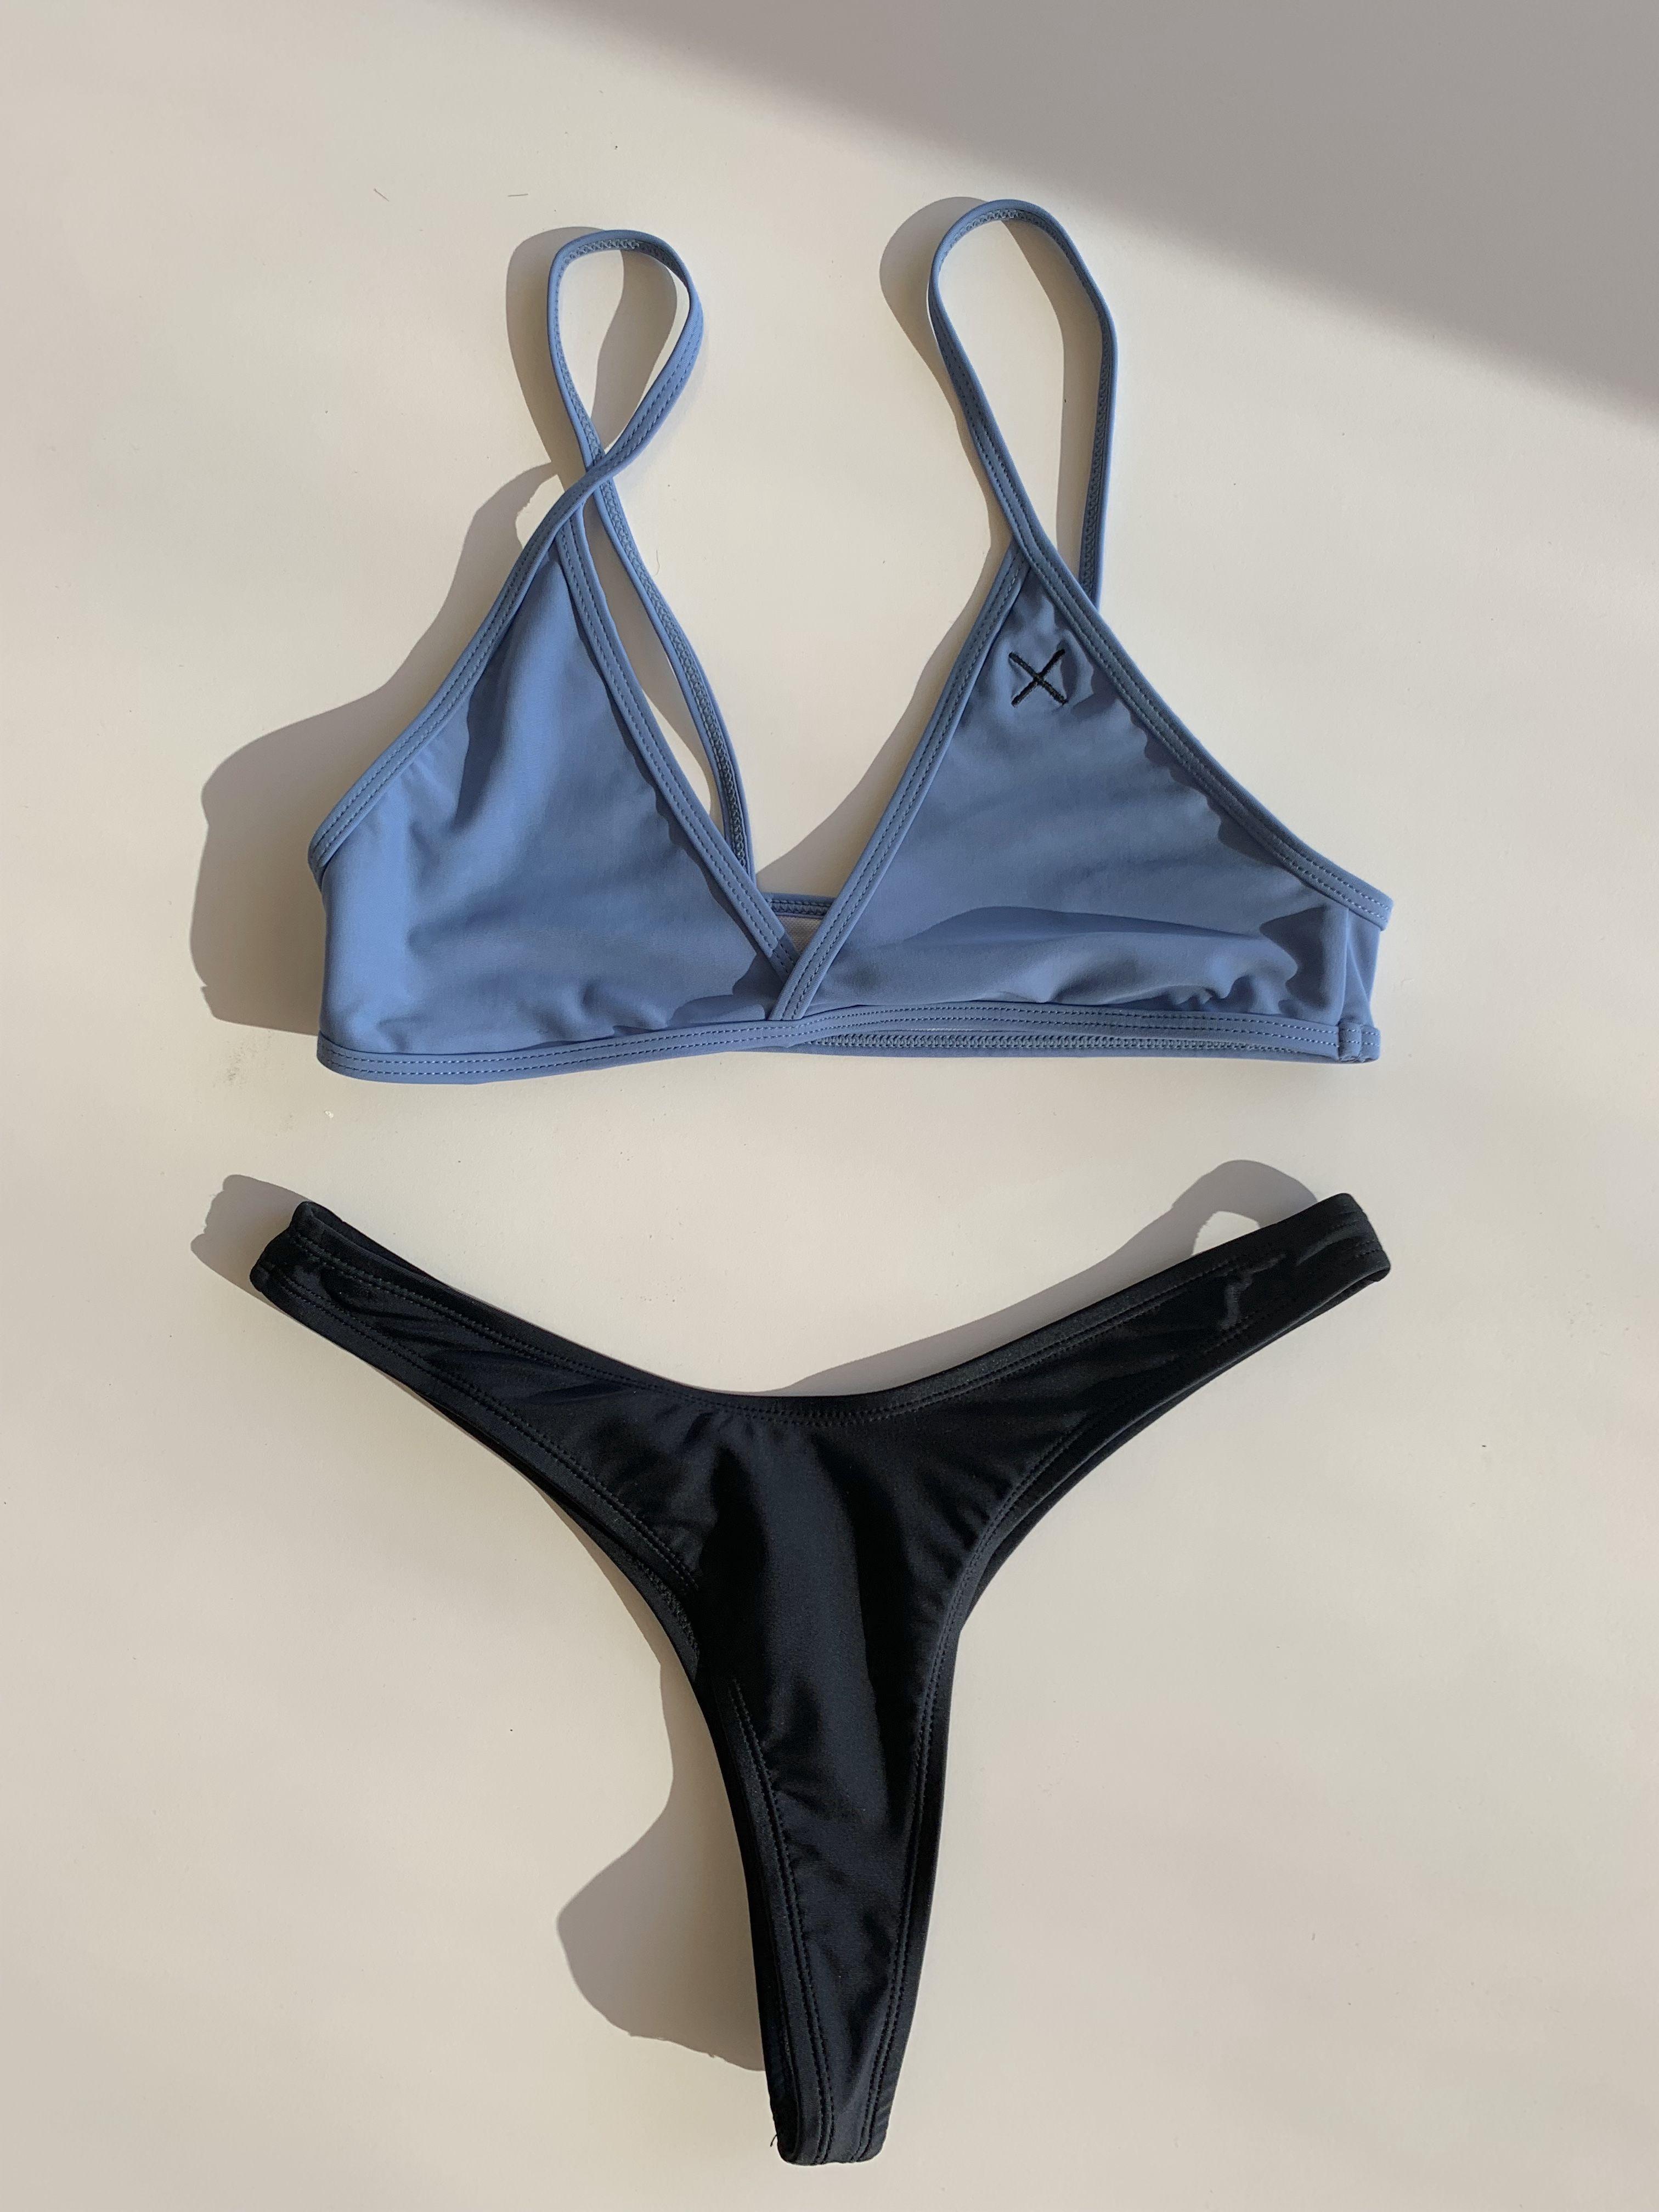 fe024a534 Boutine La, Size Chart, Manhattan, Bathing Suits, Thong Bikini, Hipster,